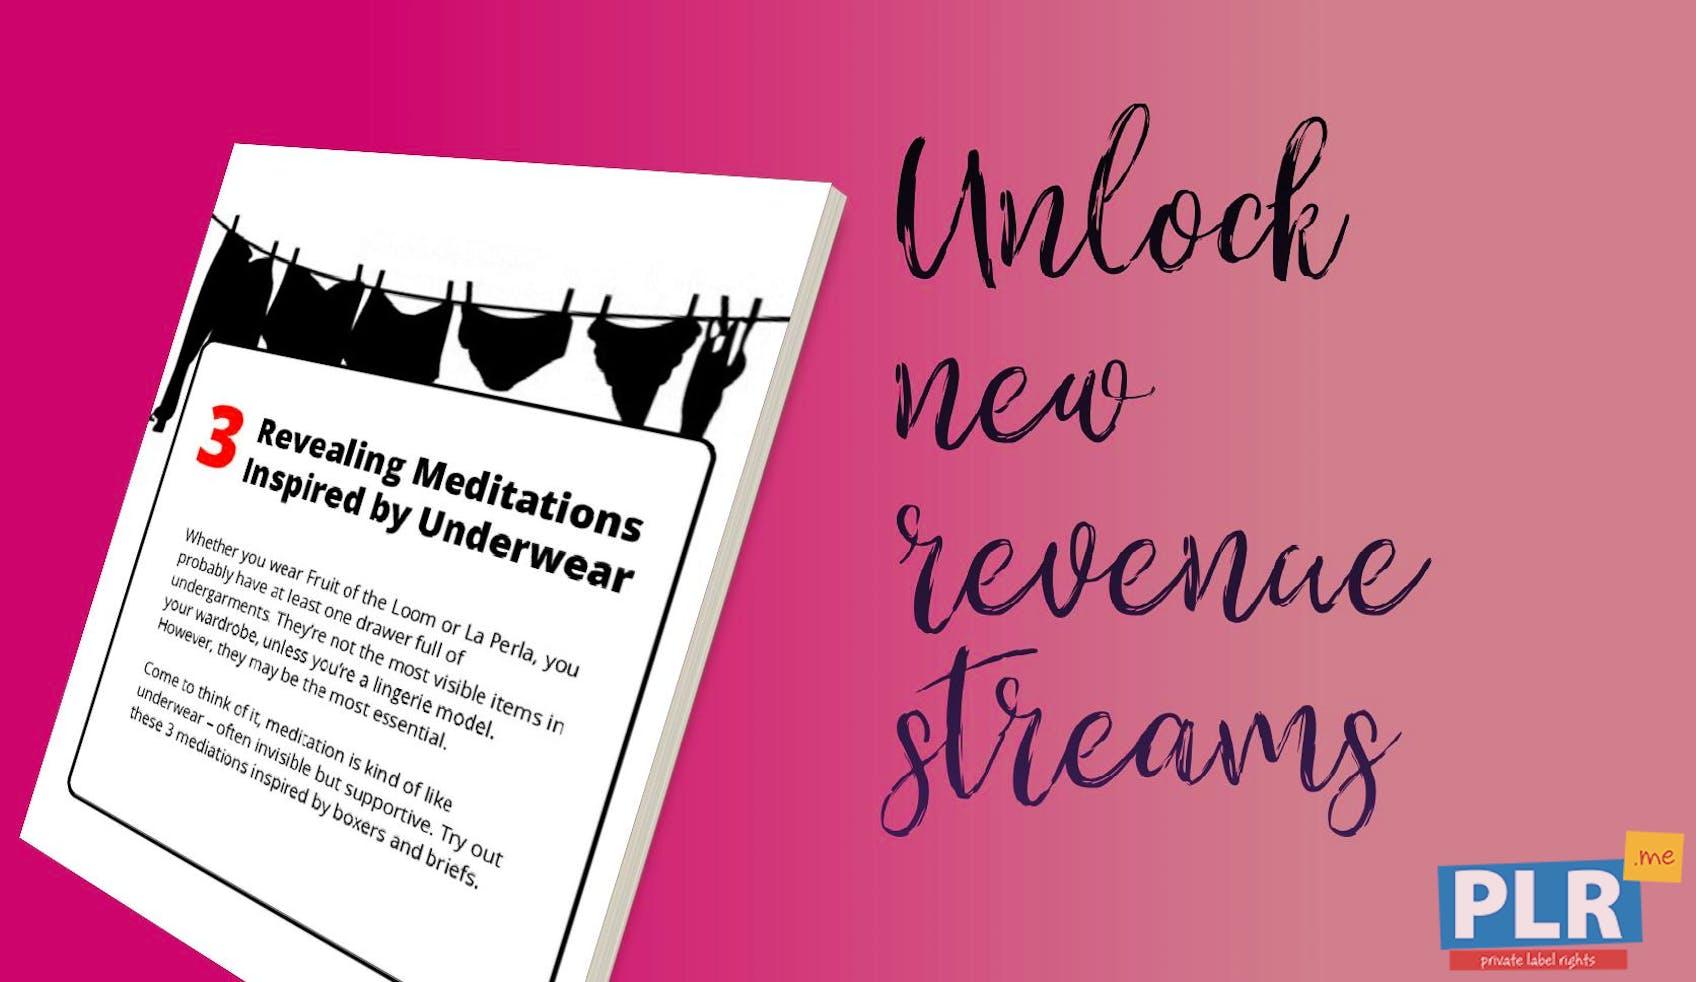 3 Revealing Meditations Inspired By Underwear